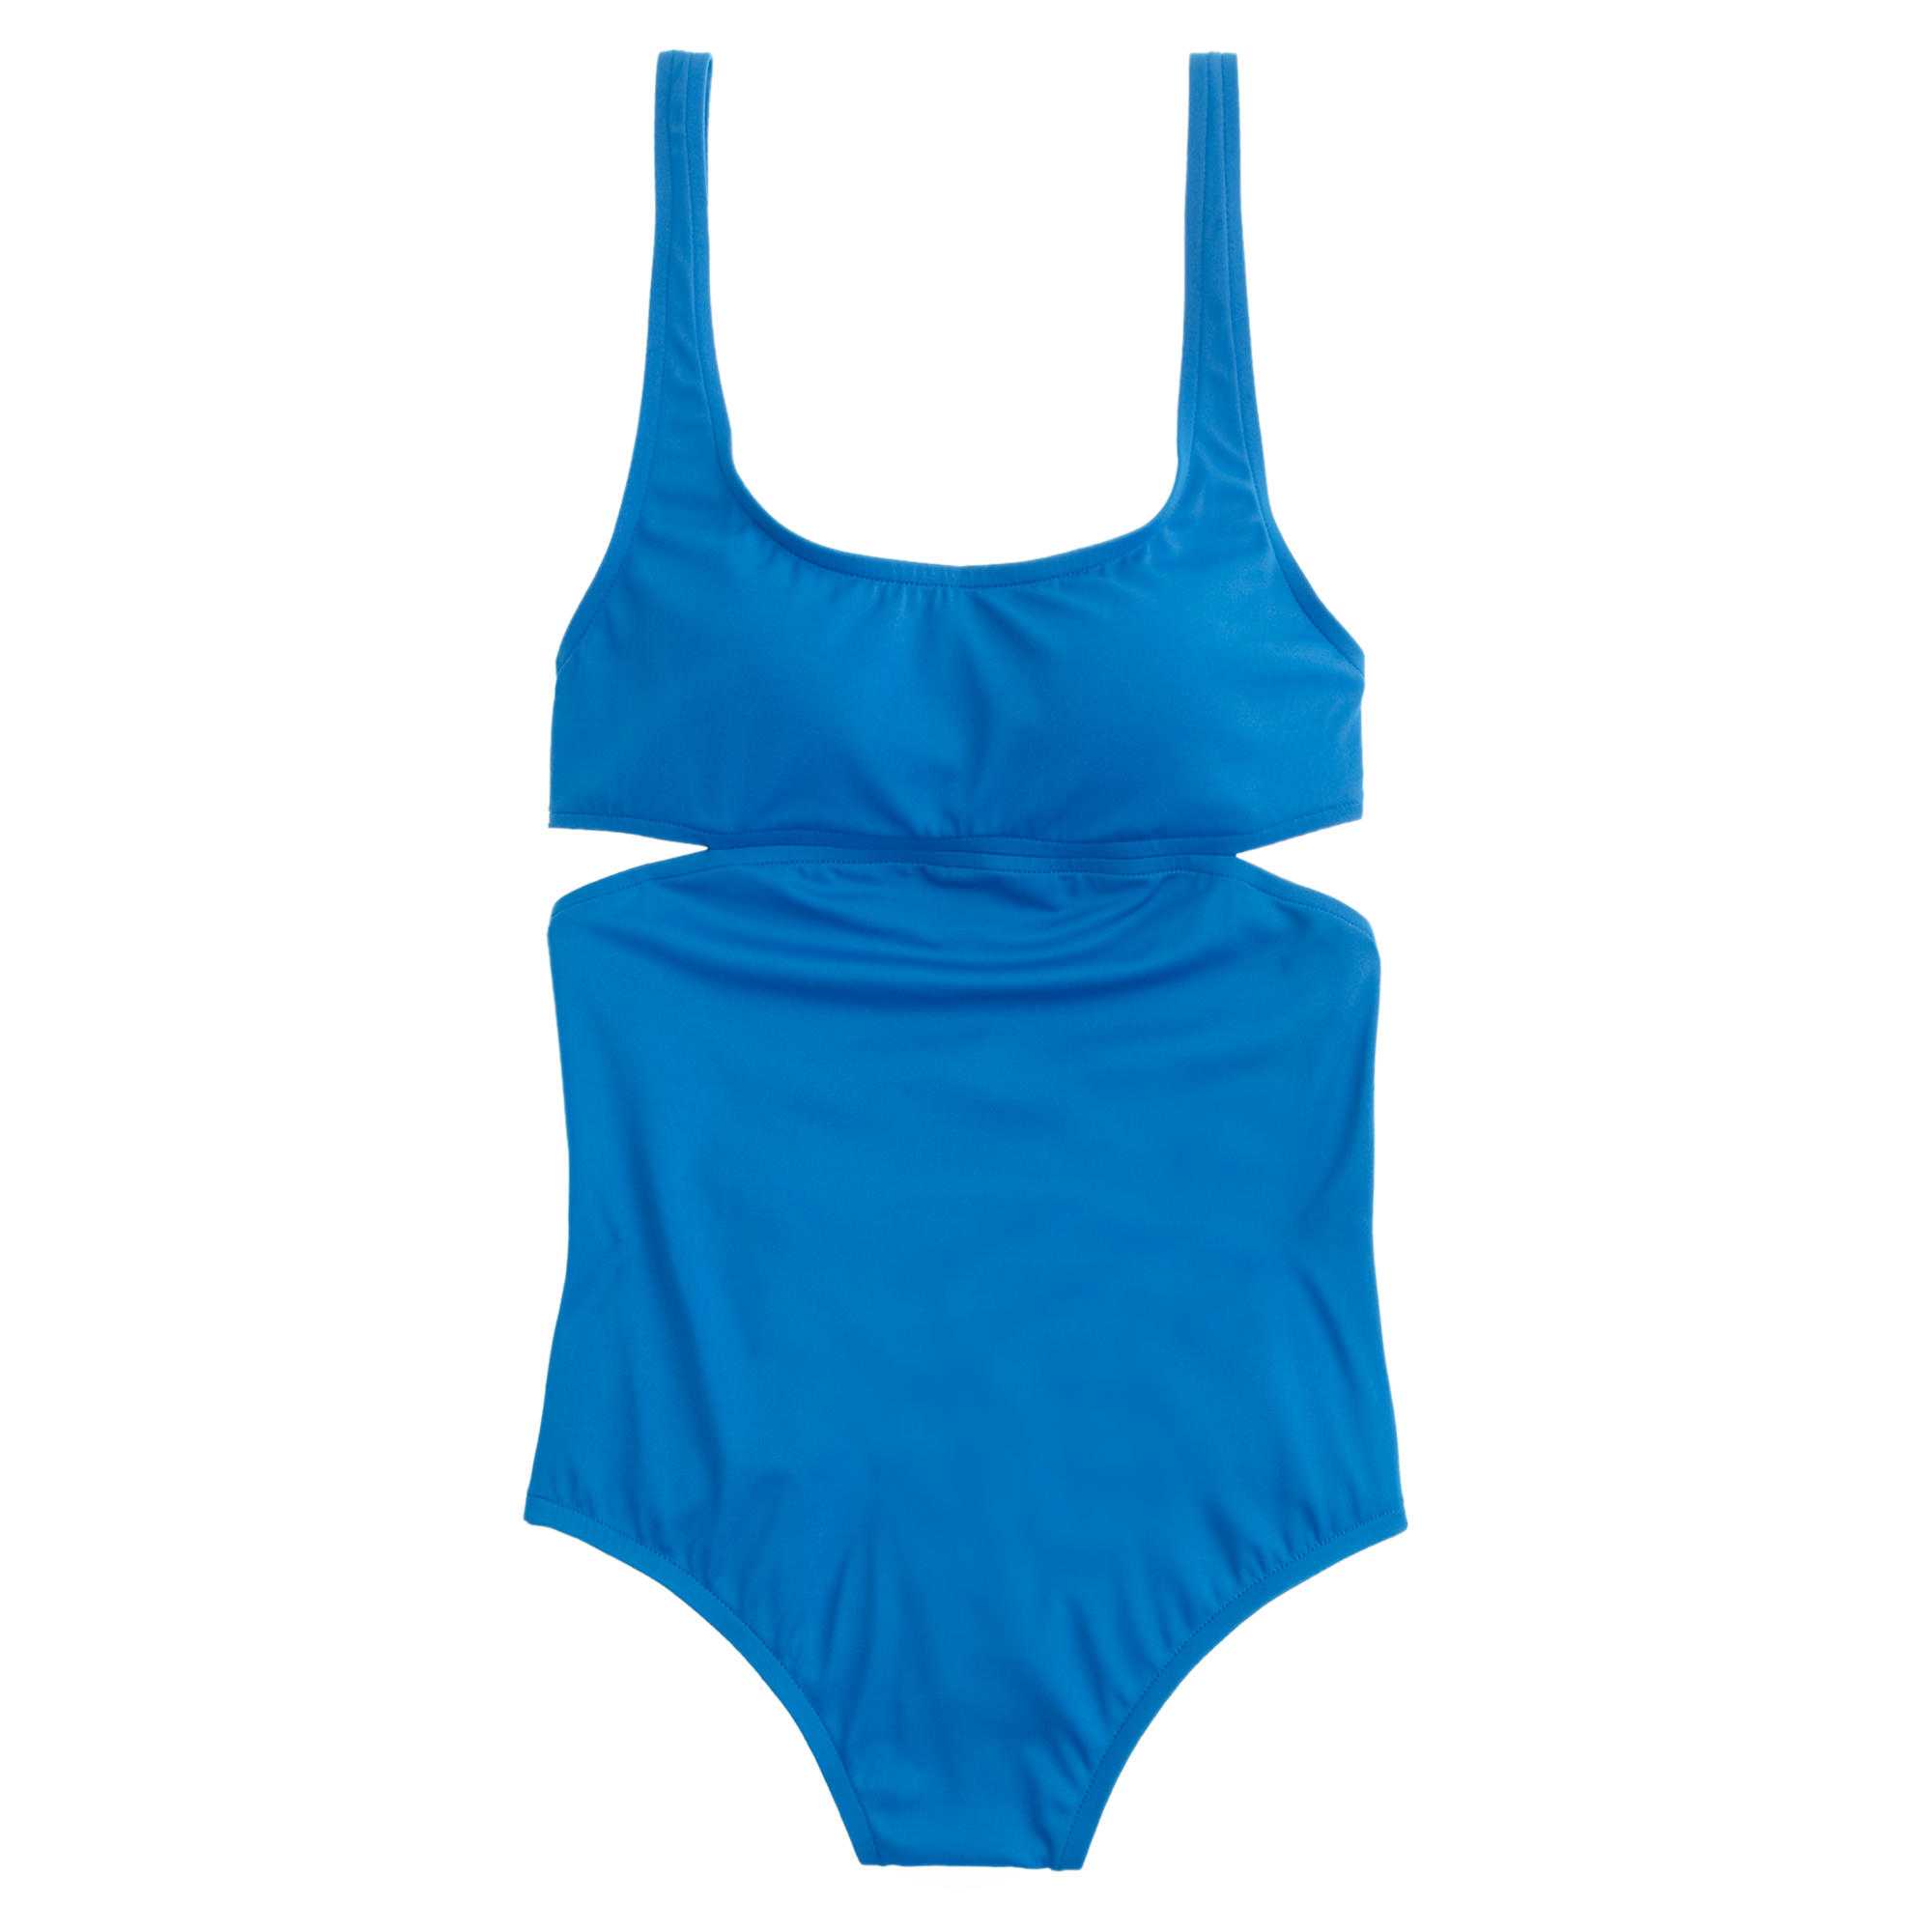 Cutout one-piece swimsuit : | J.Crew